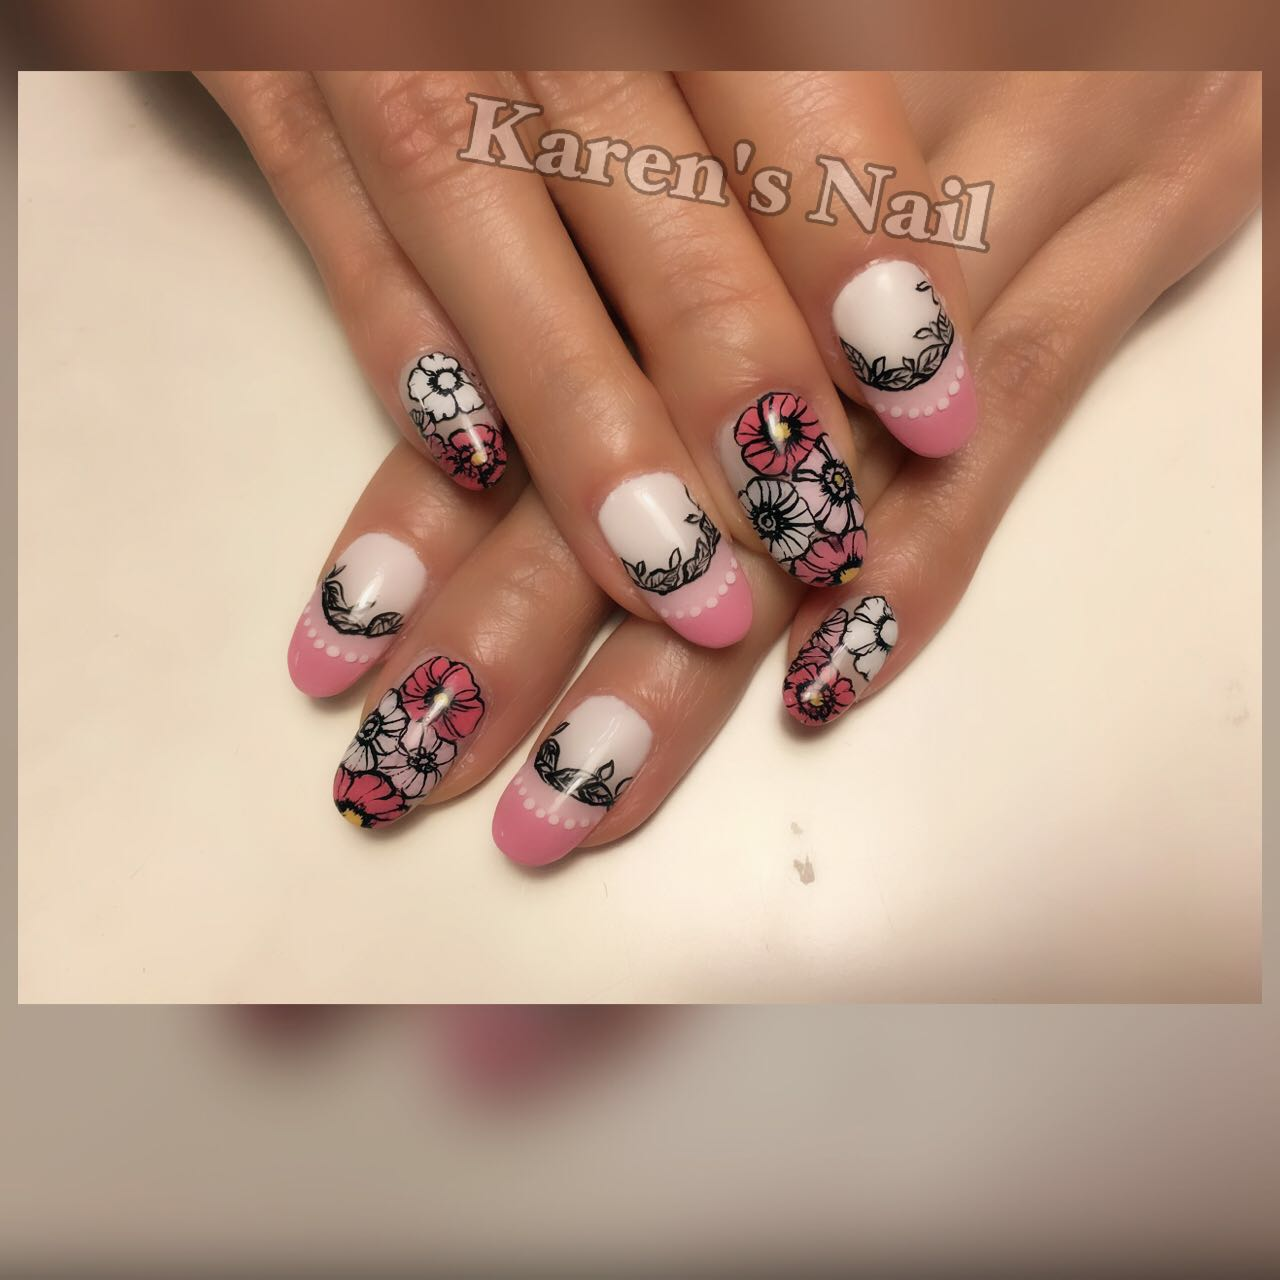 Karen's Nai,nail,finger,nail care,hand,manicure